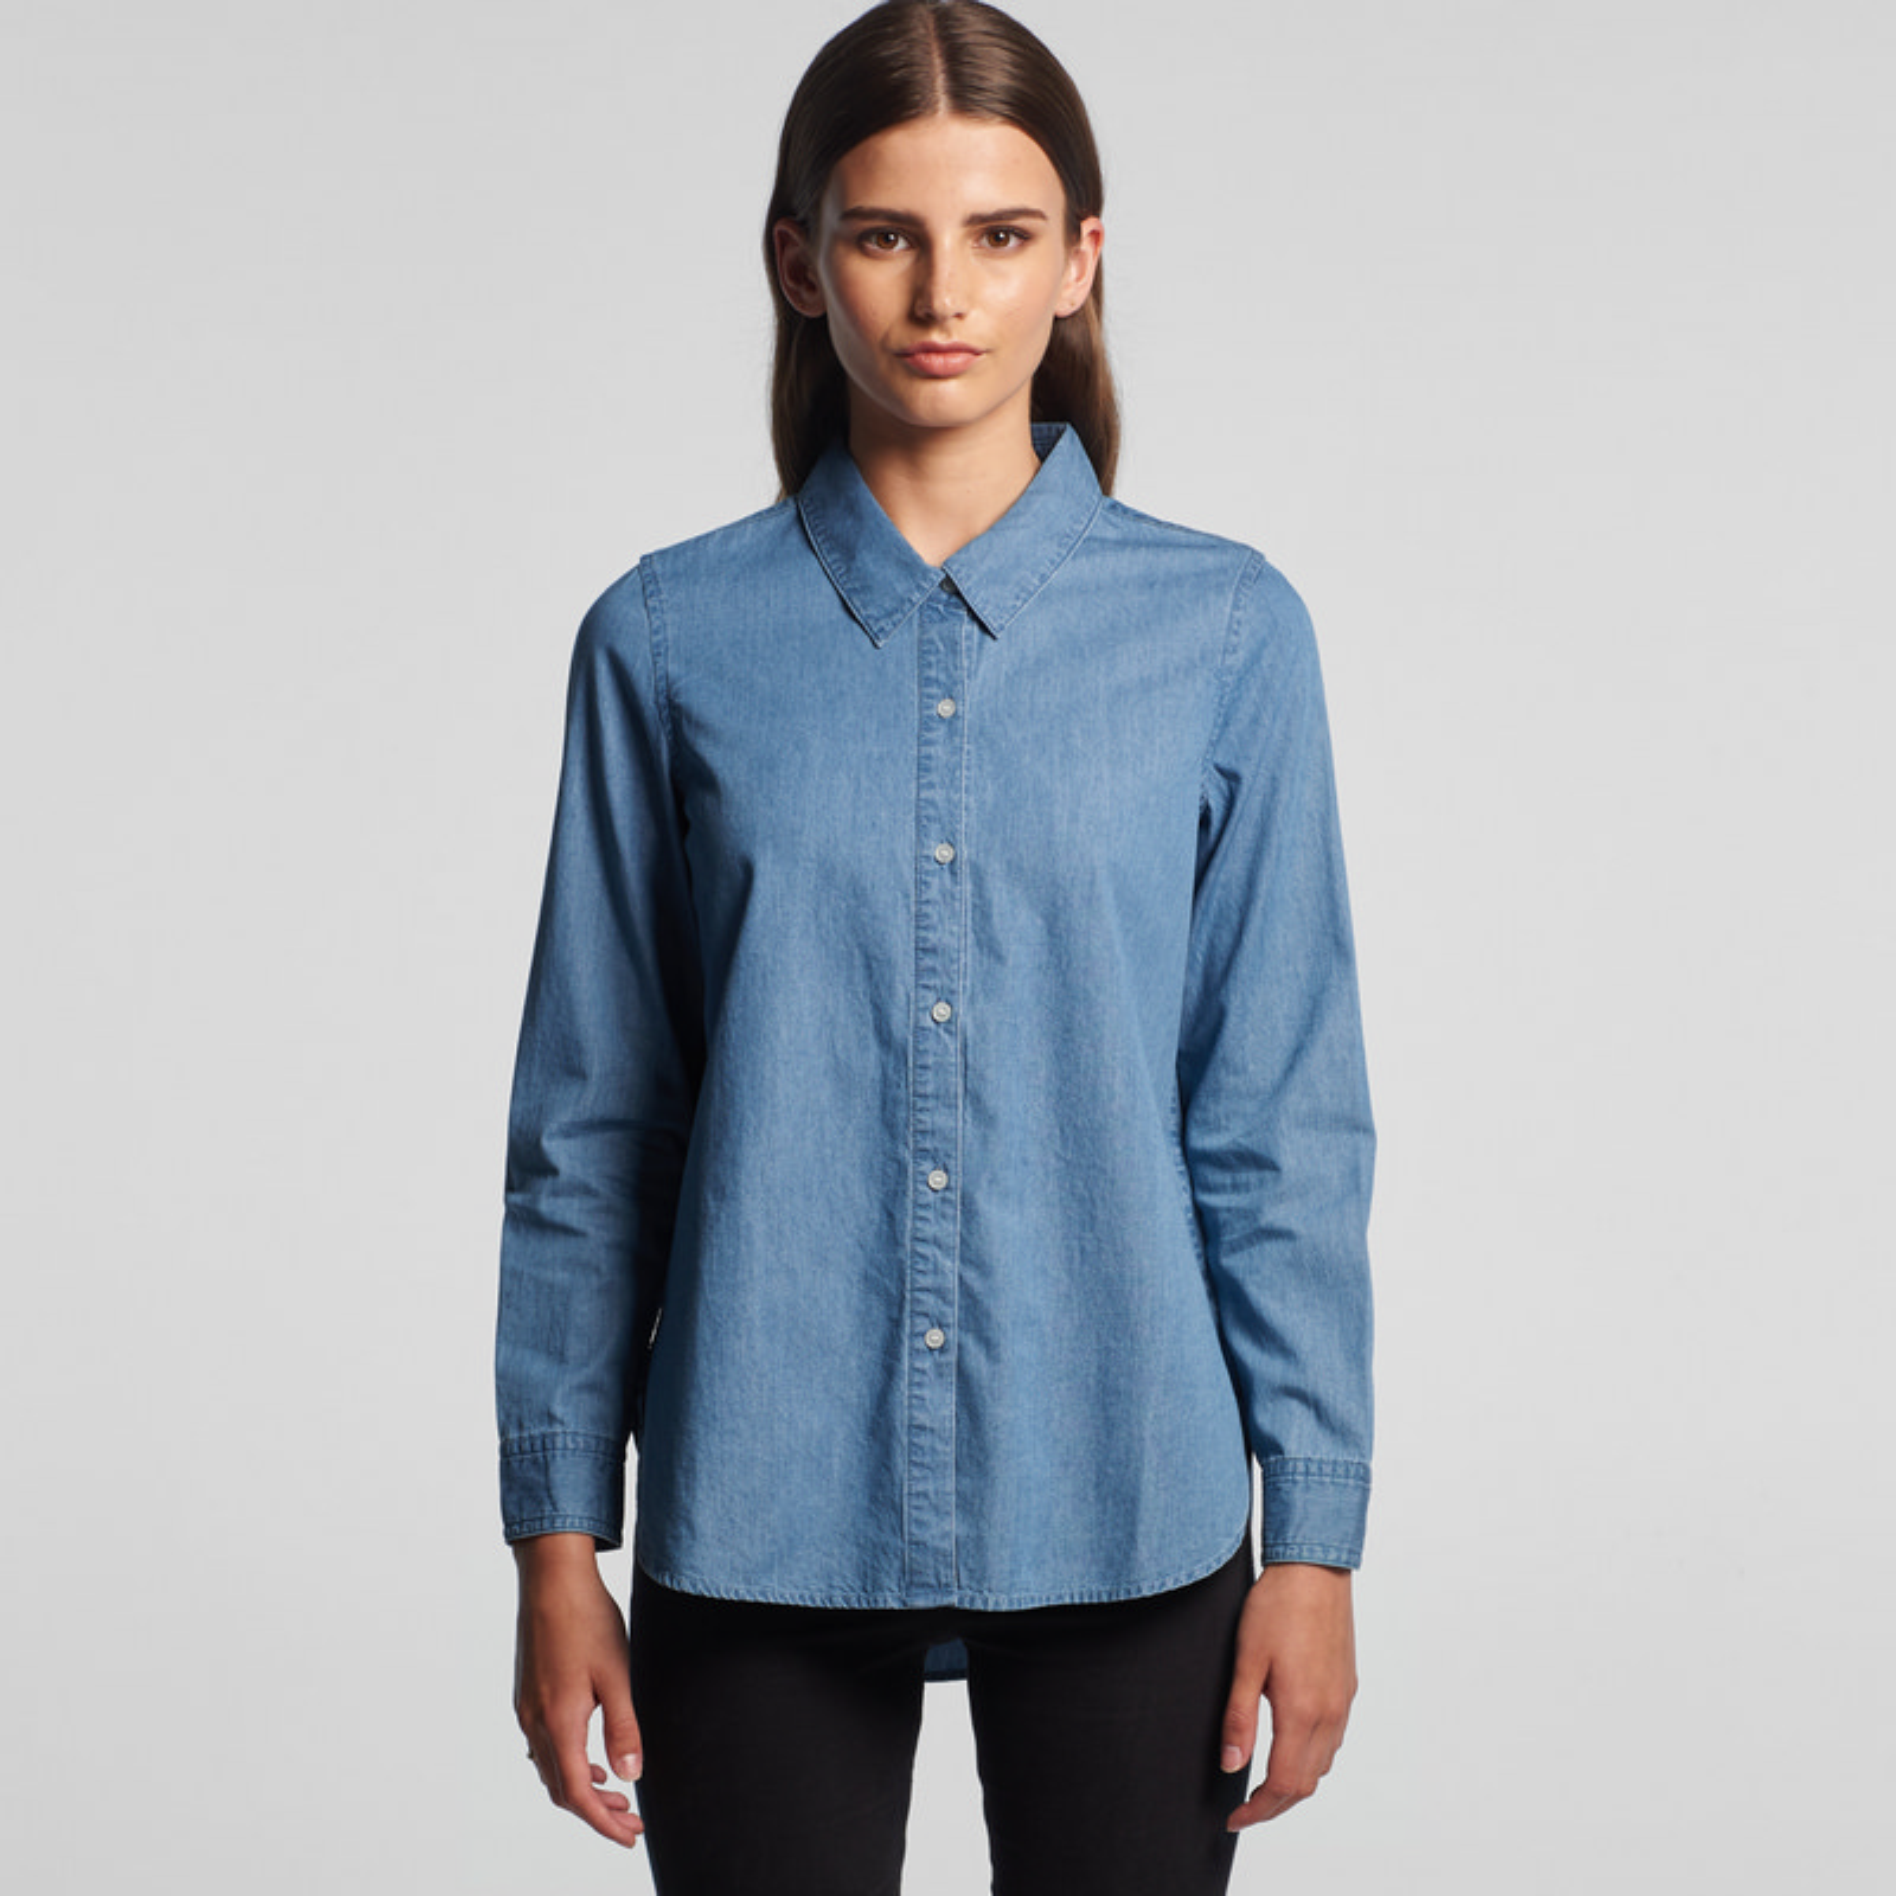 AS Colour Blue Denim Shirt